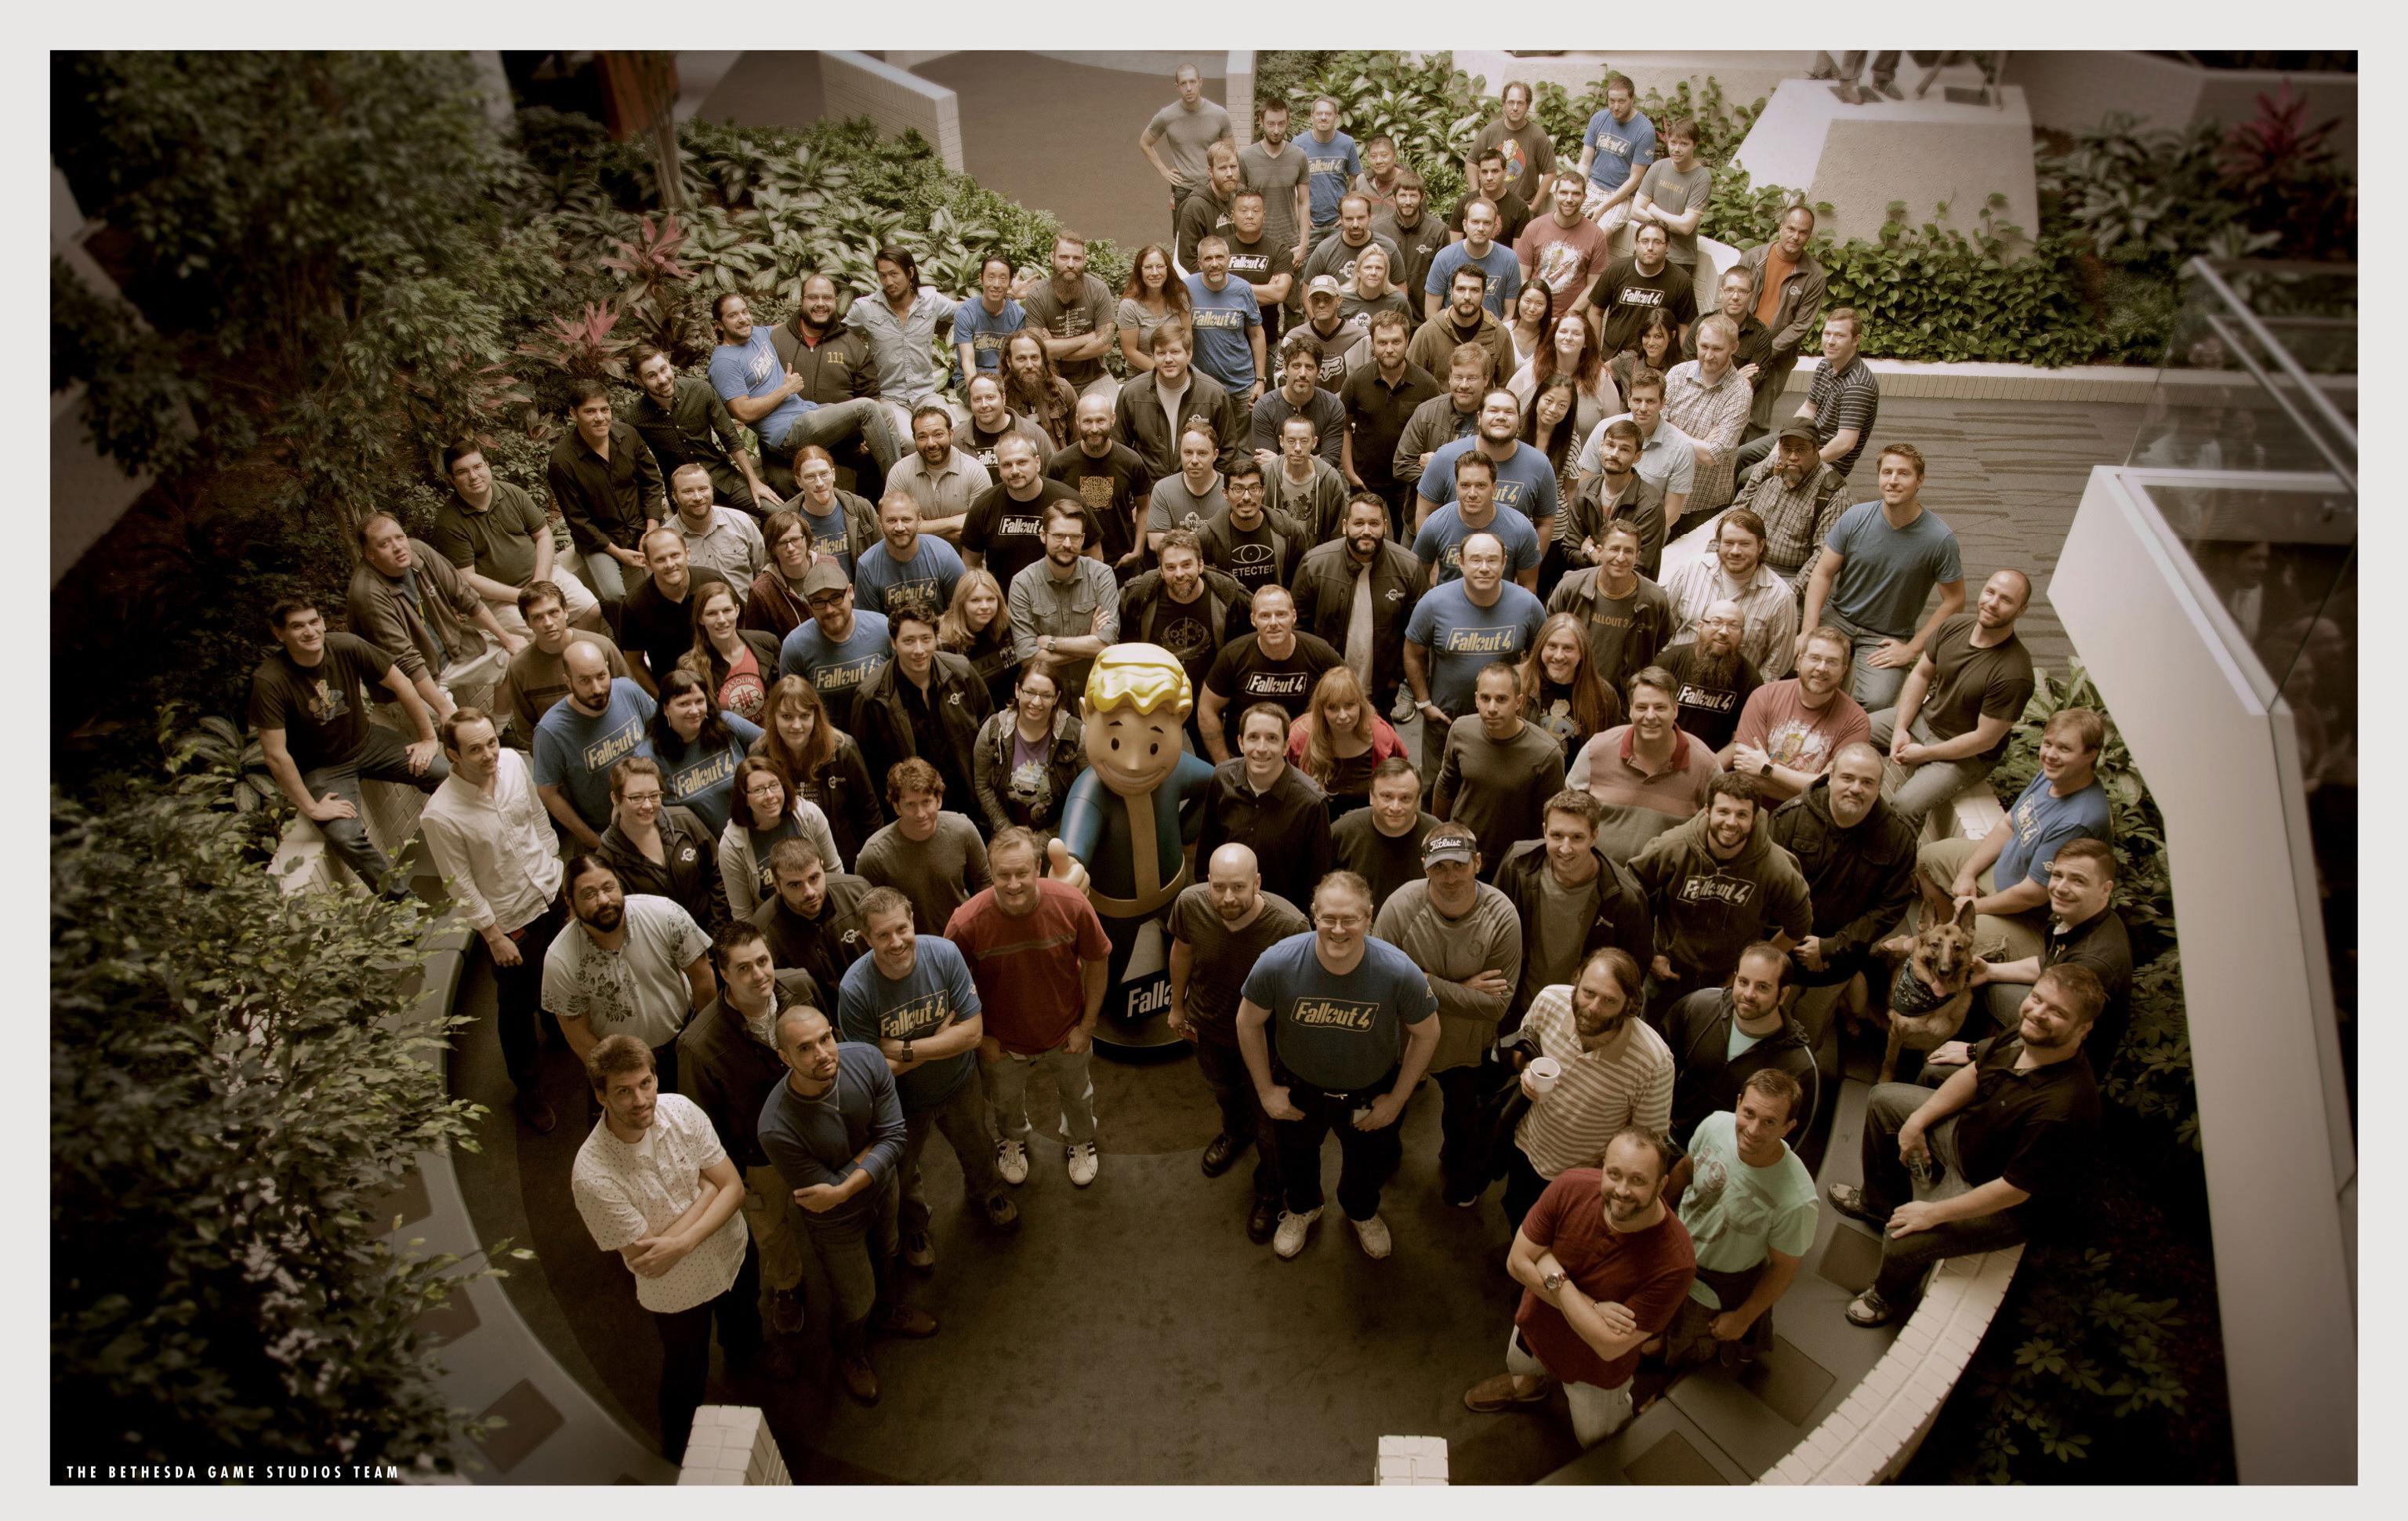 The Bethesda Game Studios Team